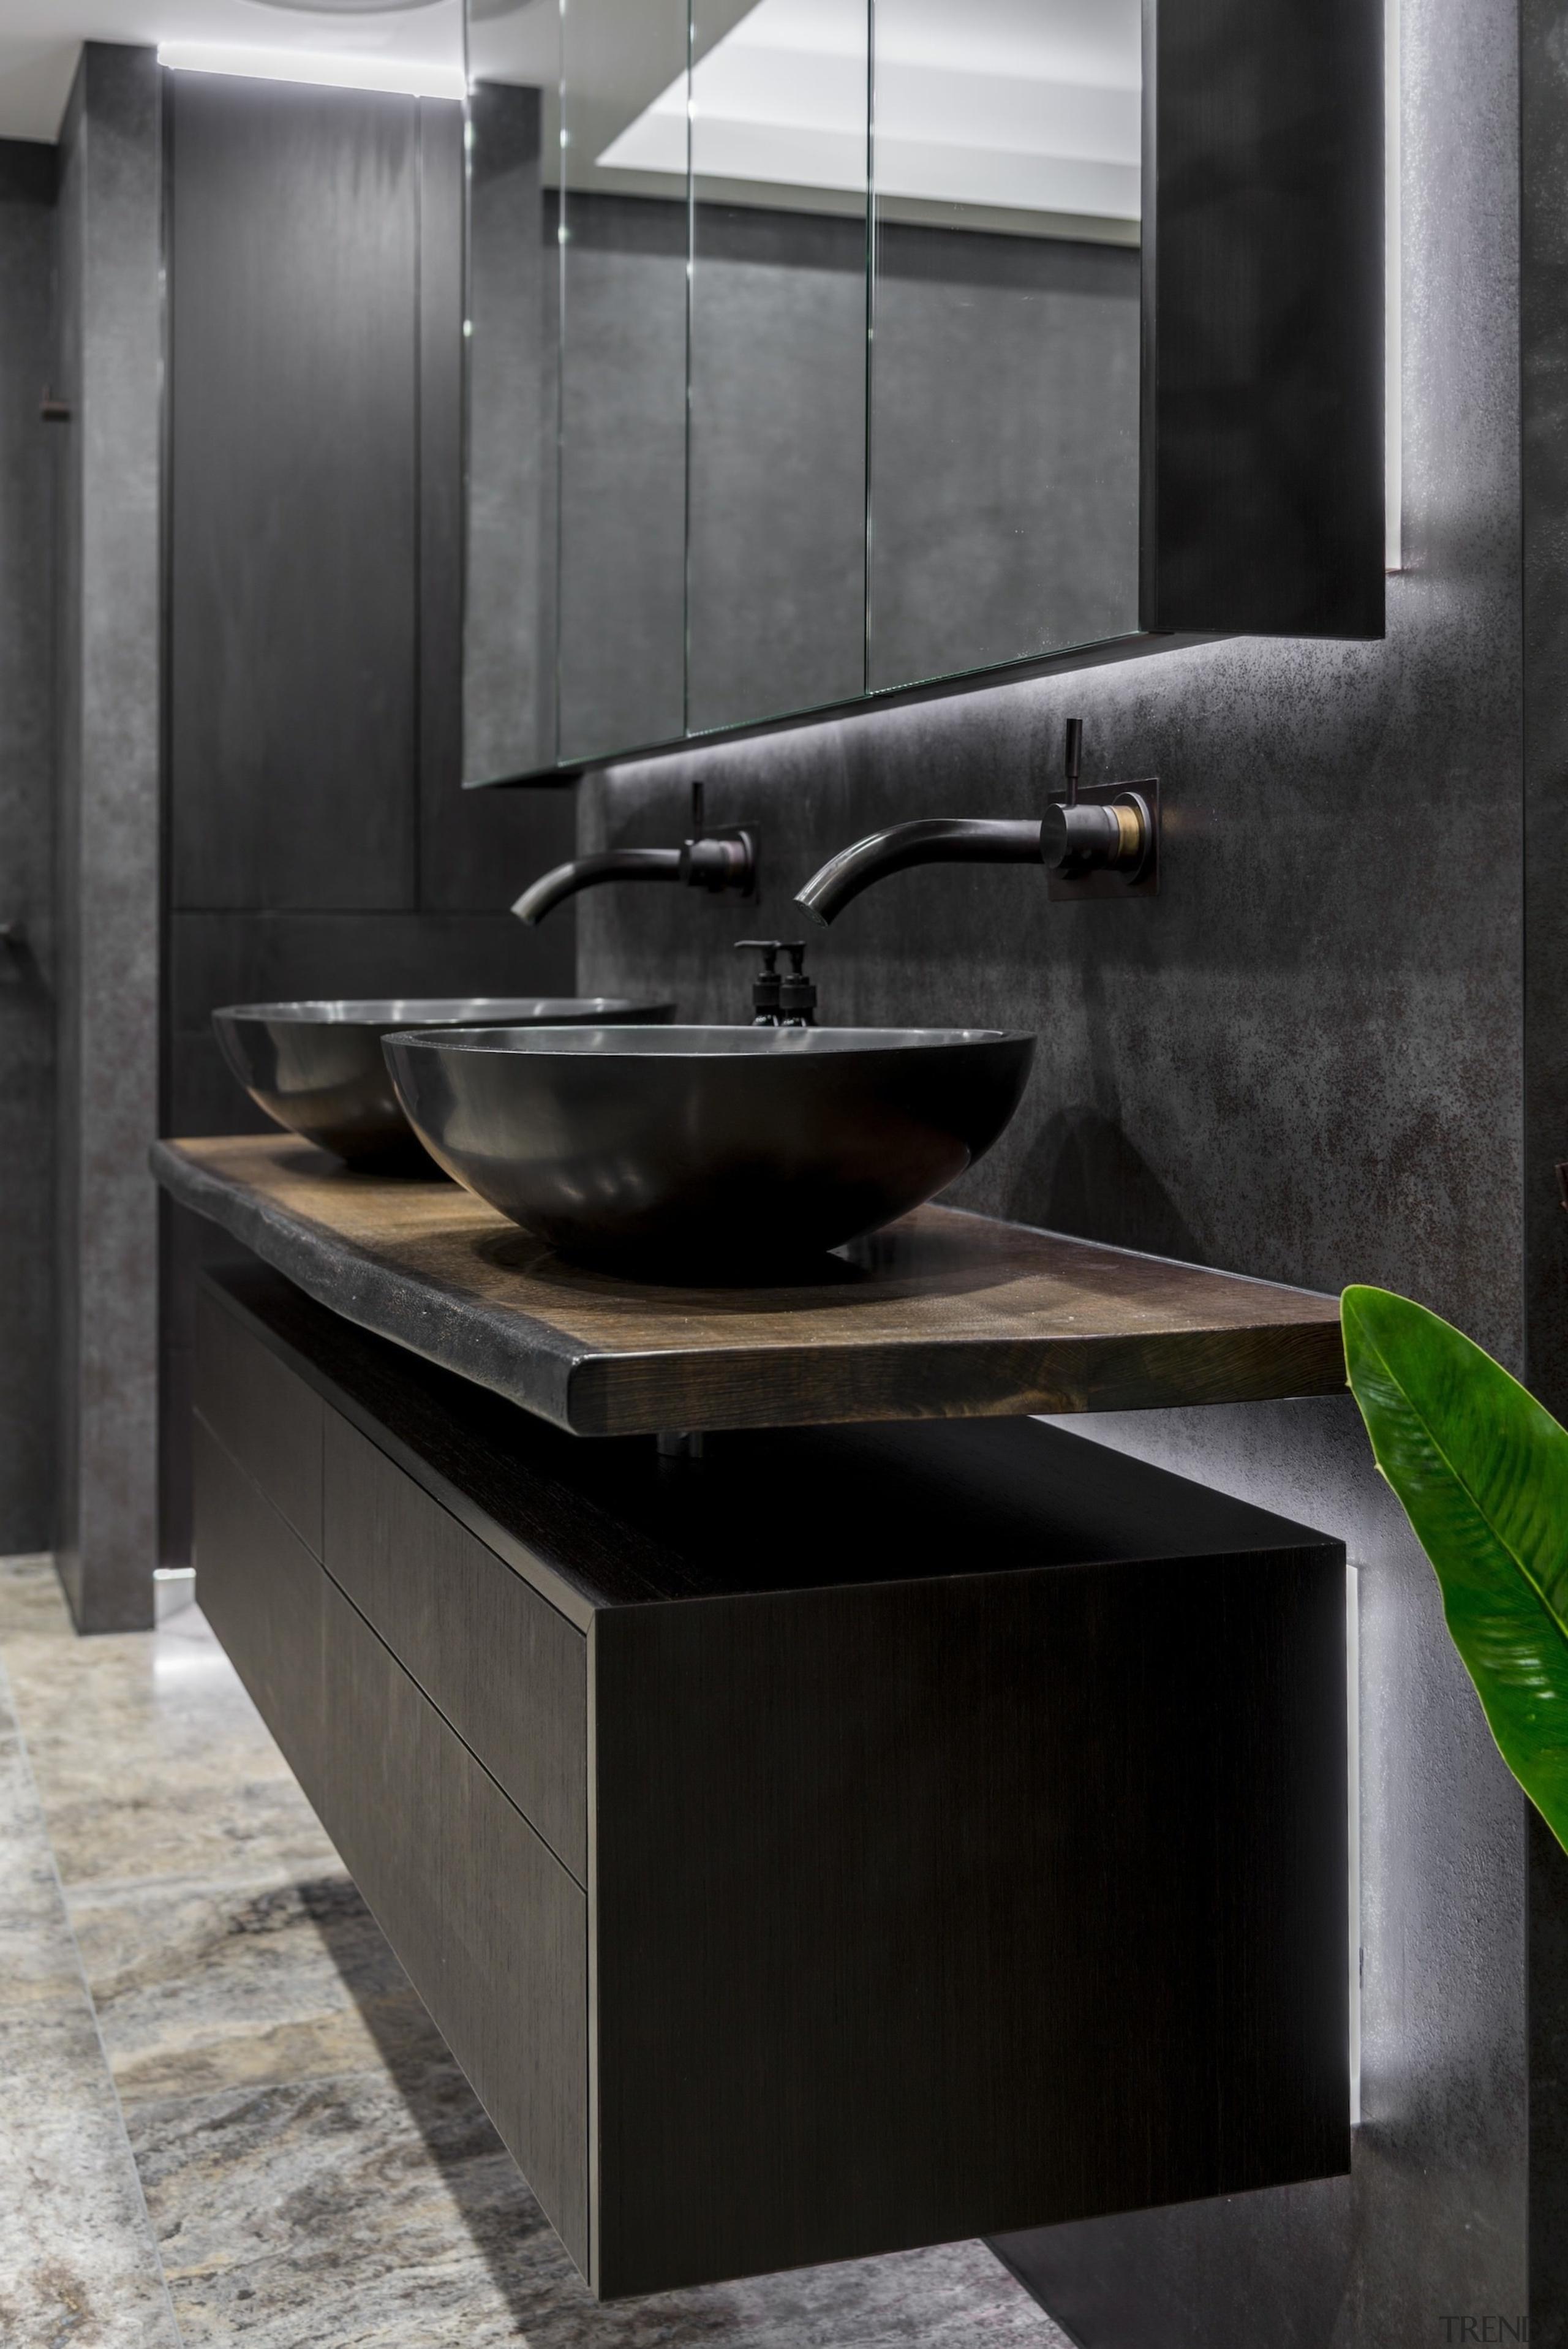 Sublime Architectural Interiors - TIDA AUS 2017 – bathroom, bathroom sink, ceramic, countertop, interior design, plumbing fixture, sink, tap, tile, black, gray